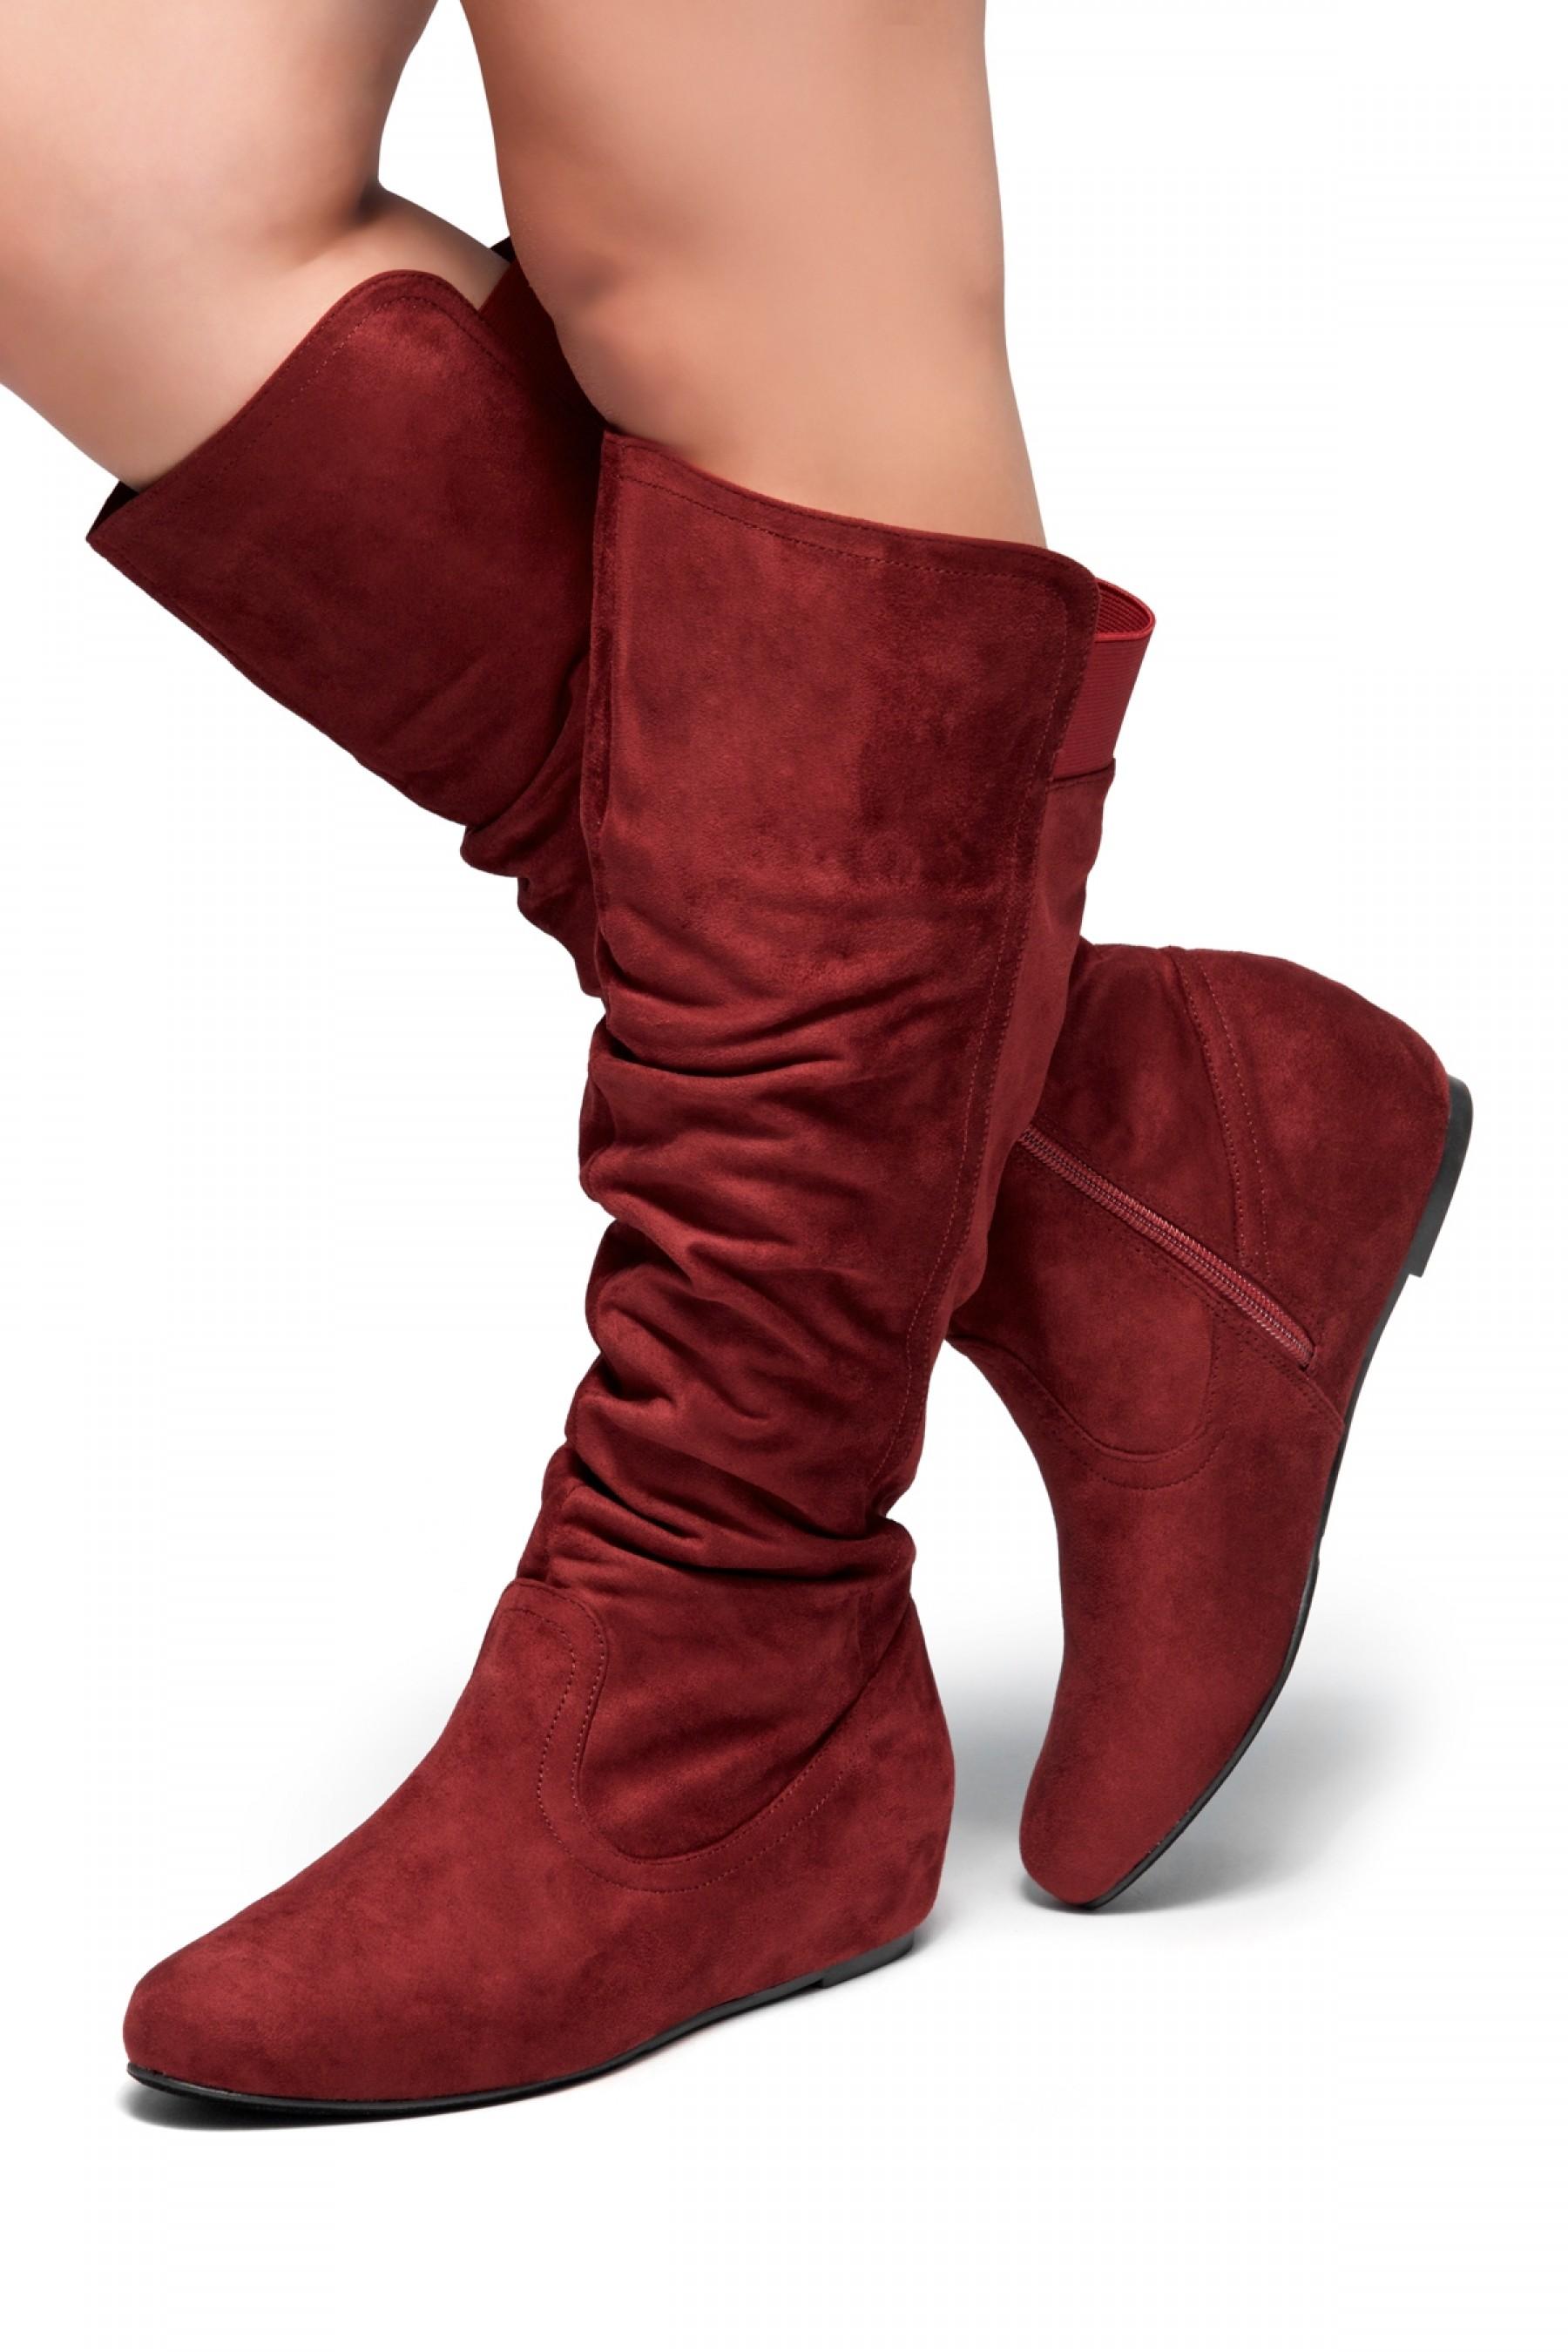 HerStyle Women's Wide Calf Faux Suede  Slouchy Hidden Wedge Boot ROSEMARRY (Burgundy)